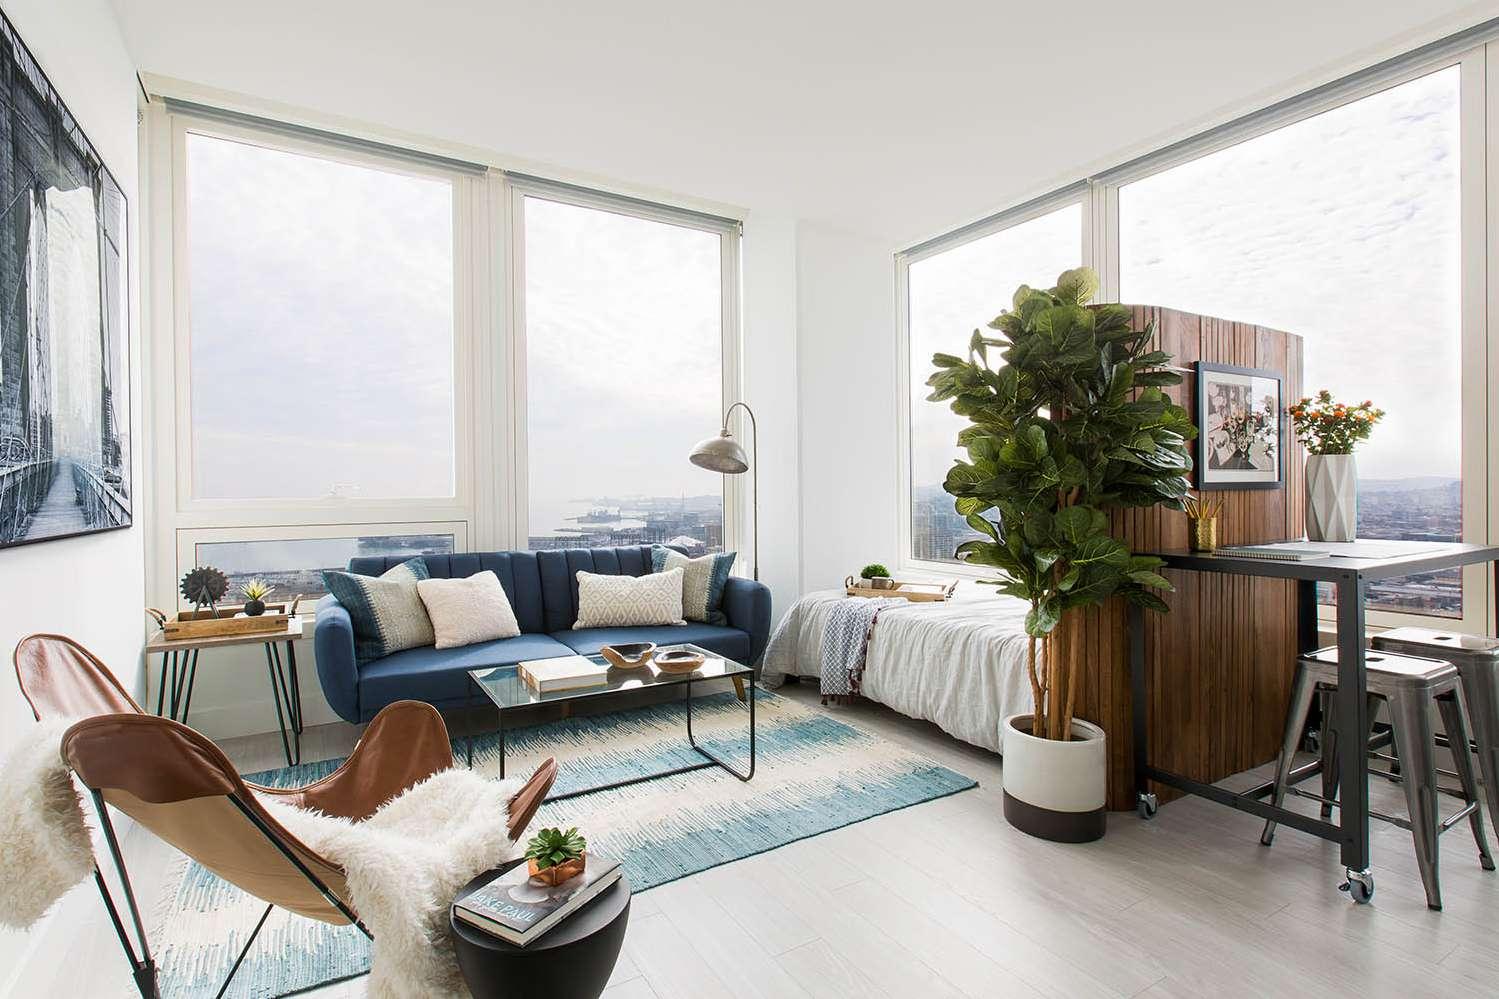 10 Fantastic Decorating Ideas For Studio Apartment 12 perfect studio apartment layouts that work 2020